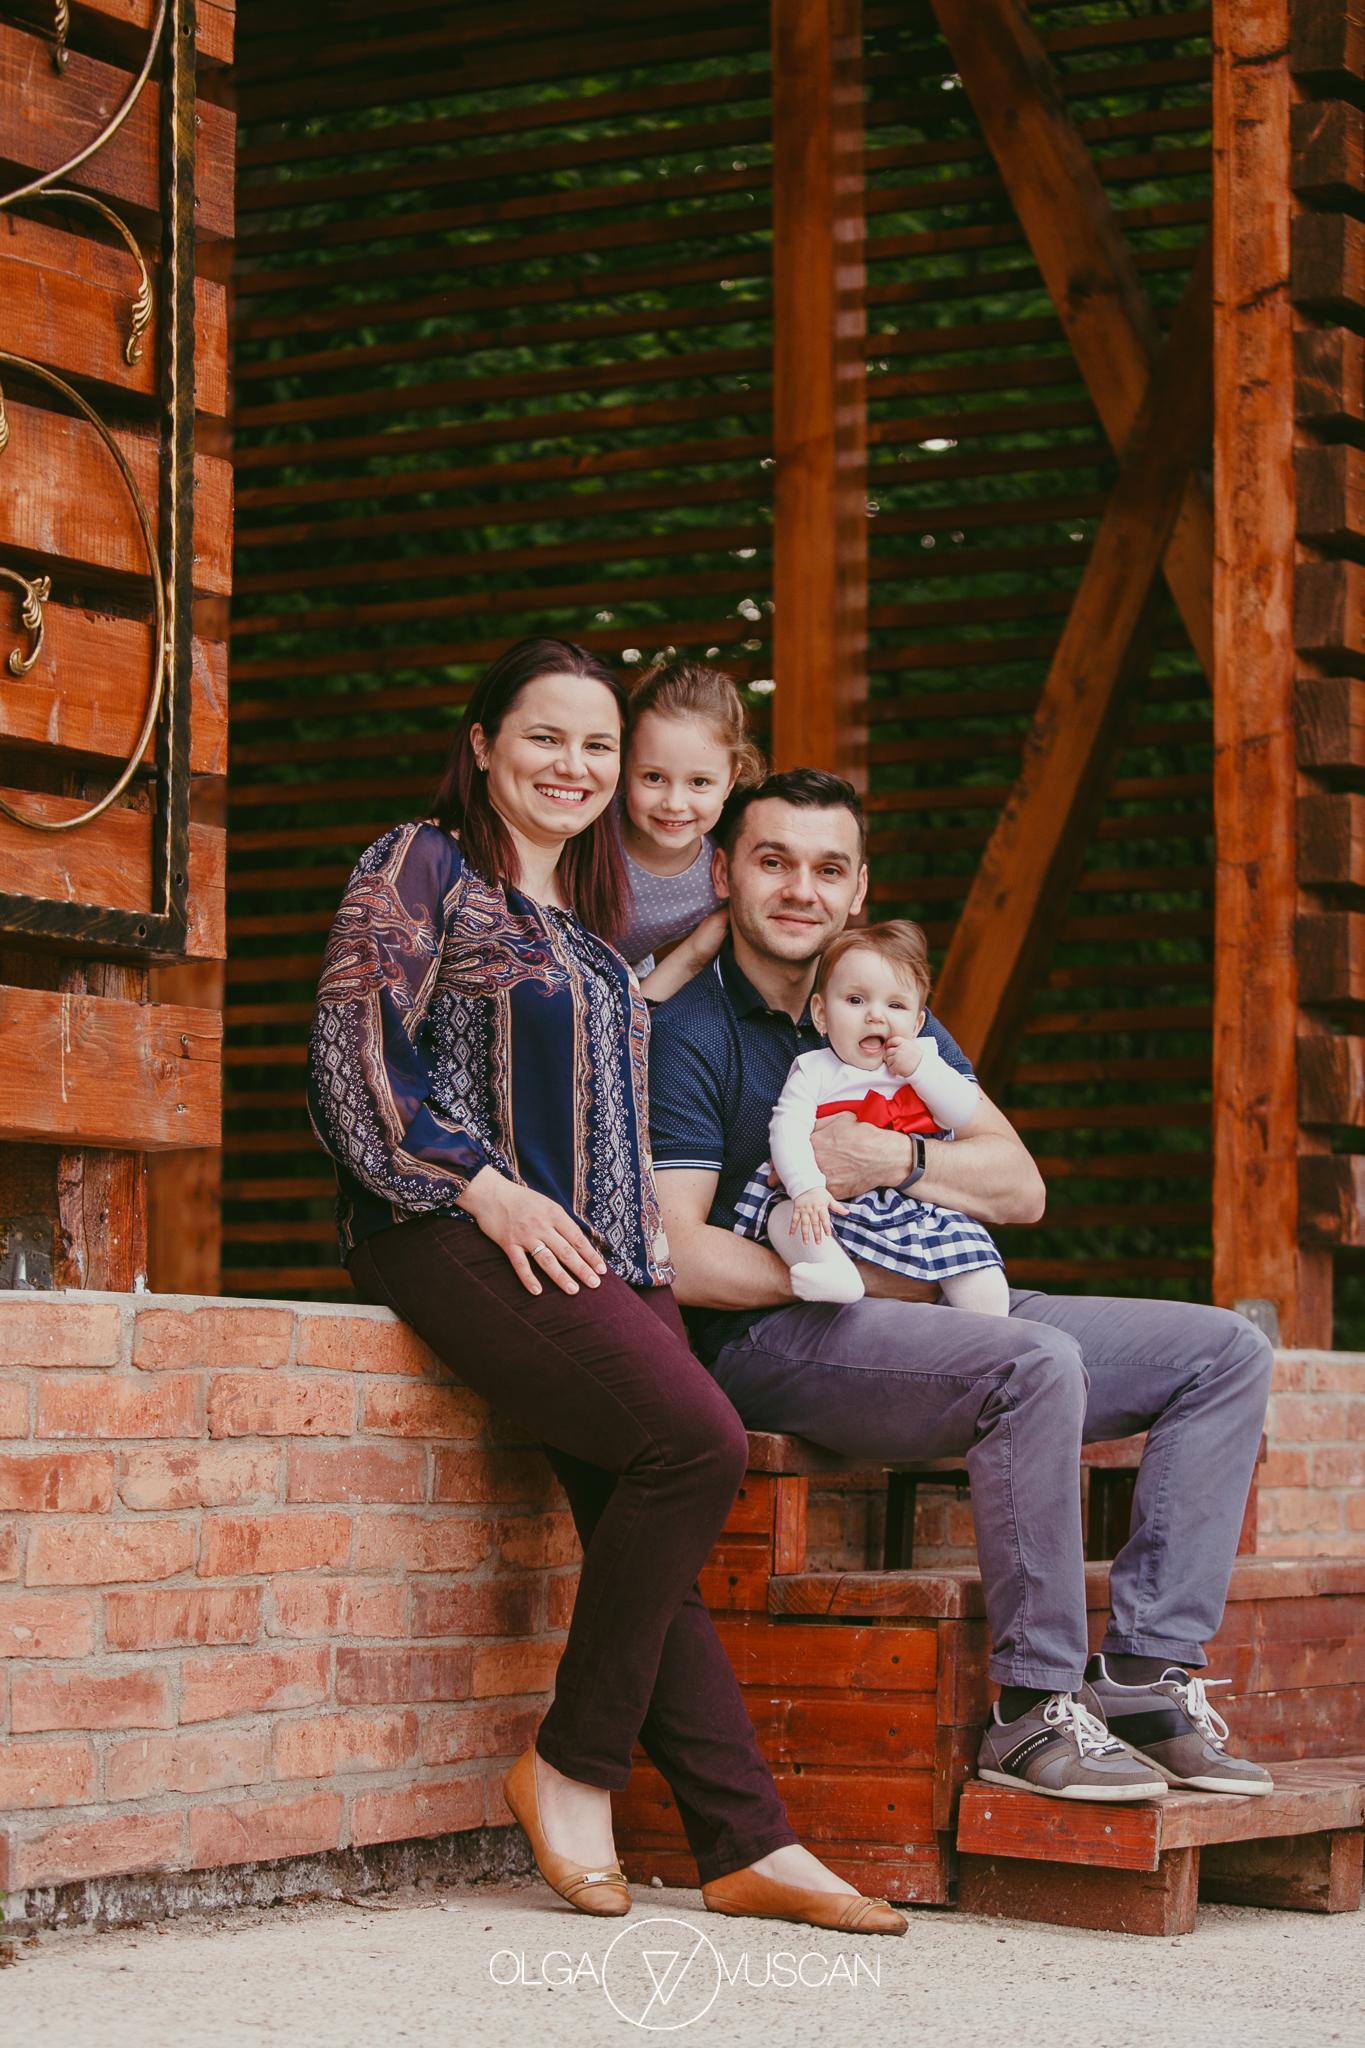 sedinta foto de familie in natura, sesiune foto copii afara, fotograf porfesionist copii Cluj, poze de familie